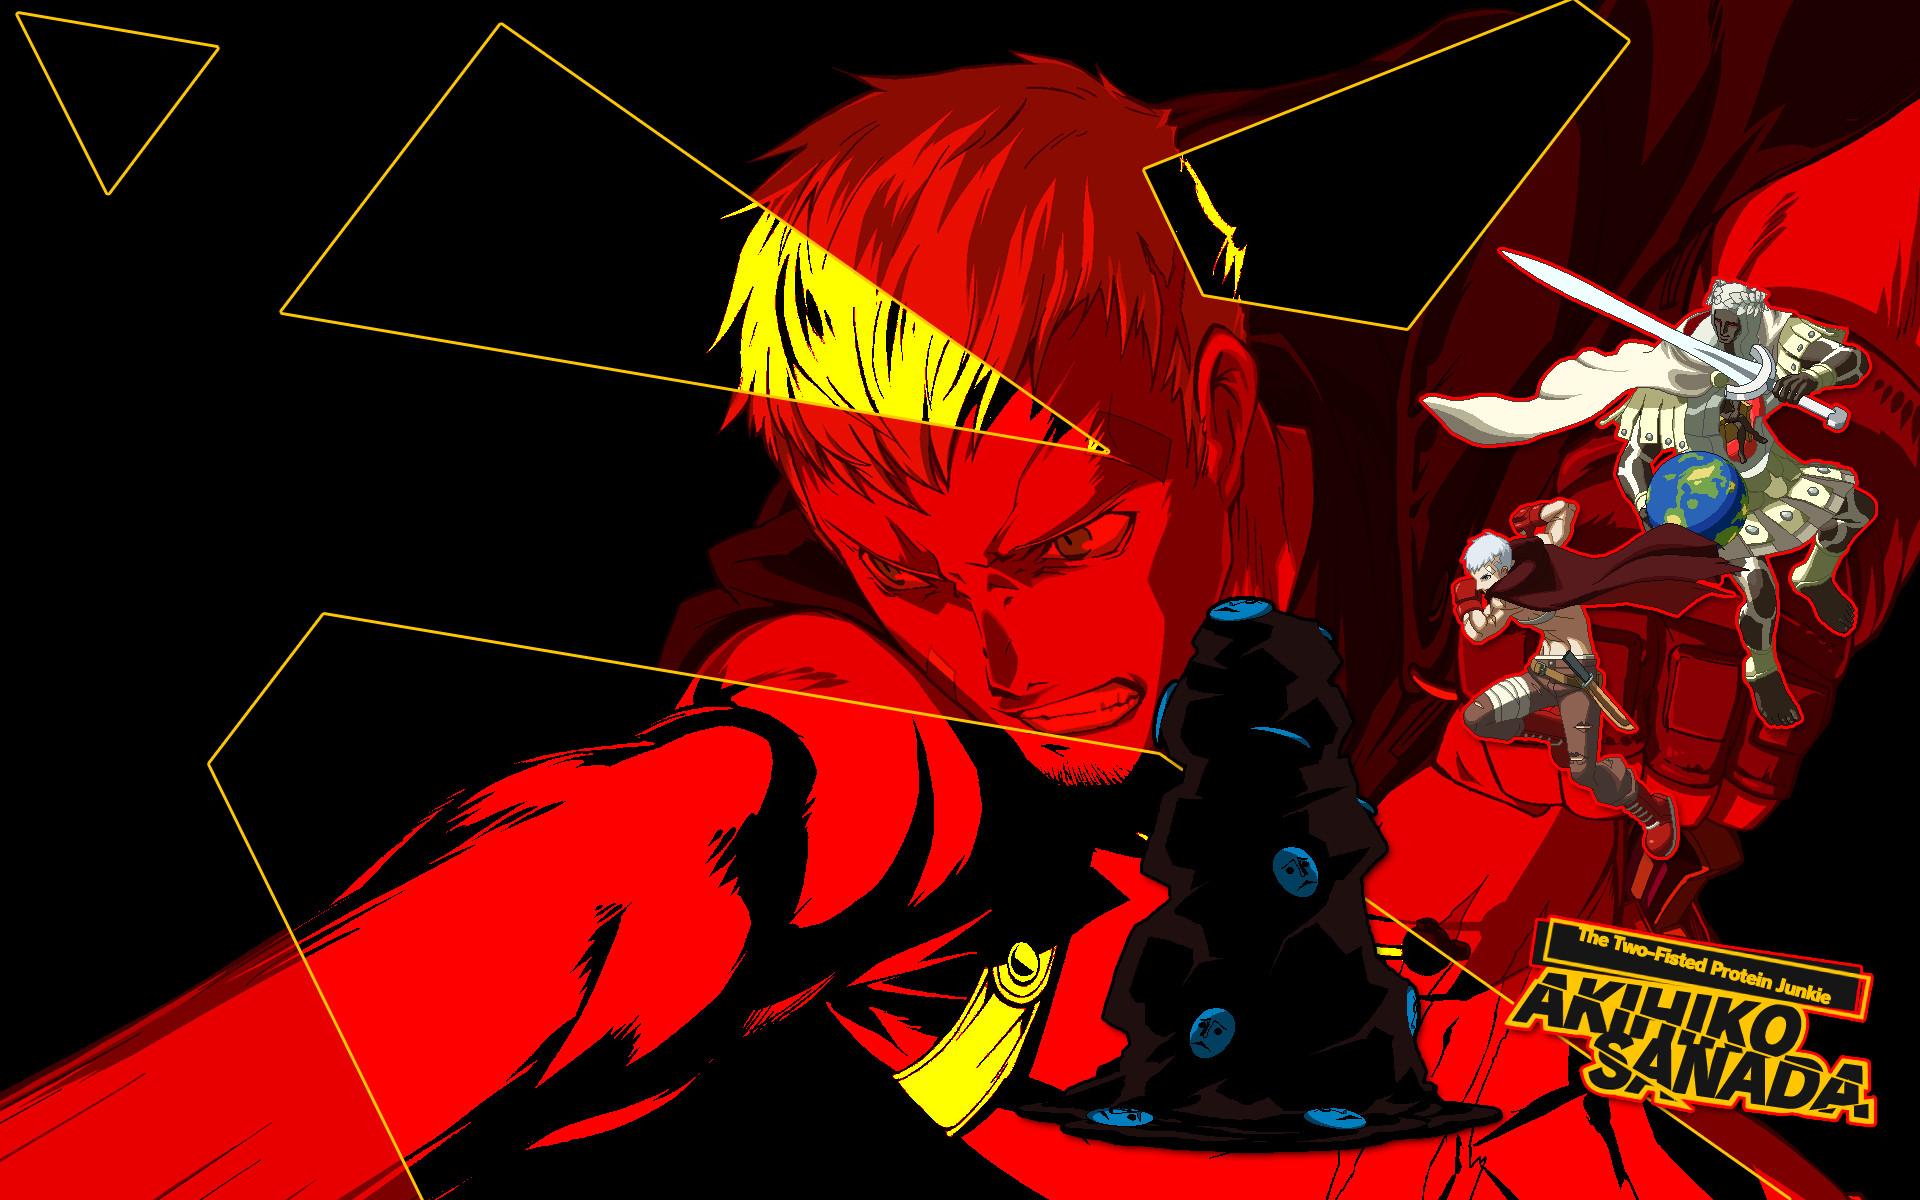 Persona 4 Arena Ultimax Elizabeth Wallpaper by DaSenpai on DeviantArt